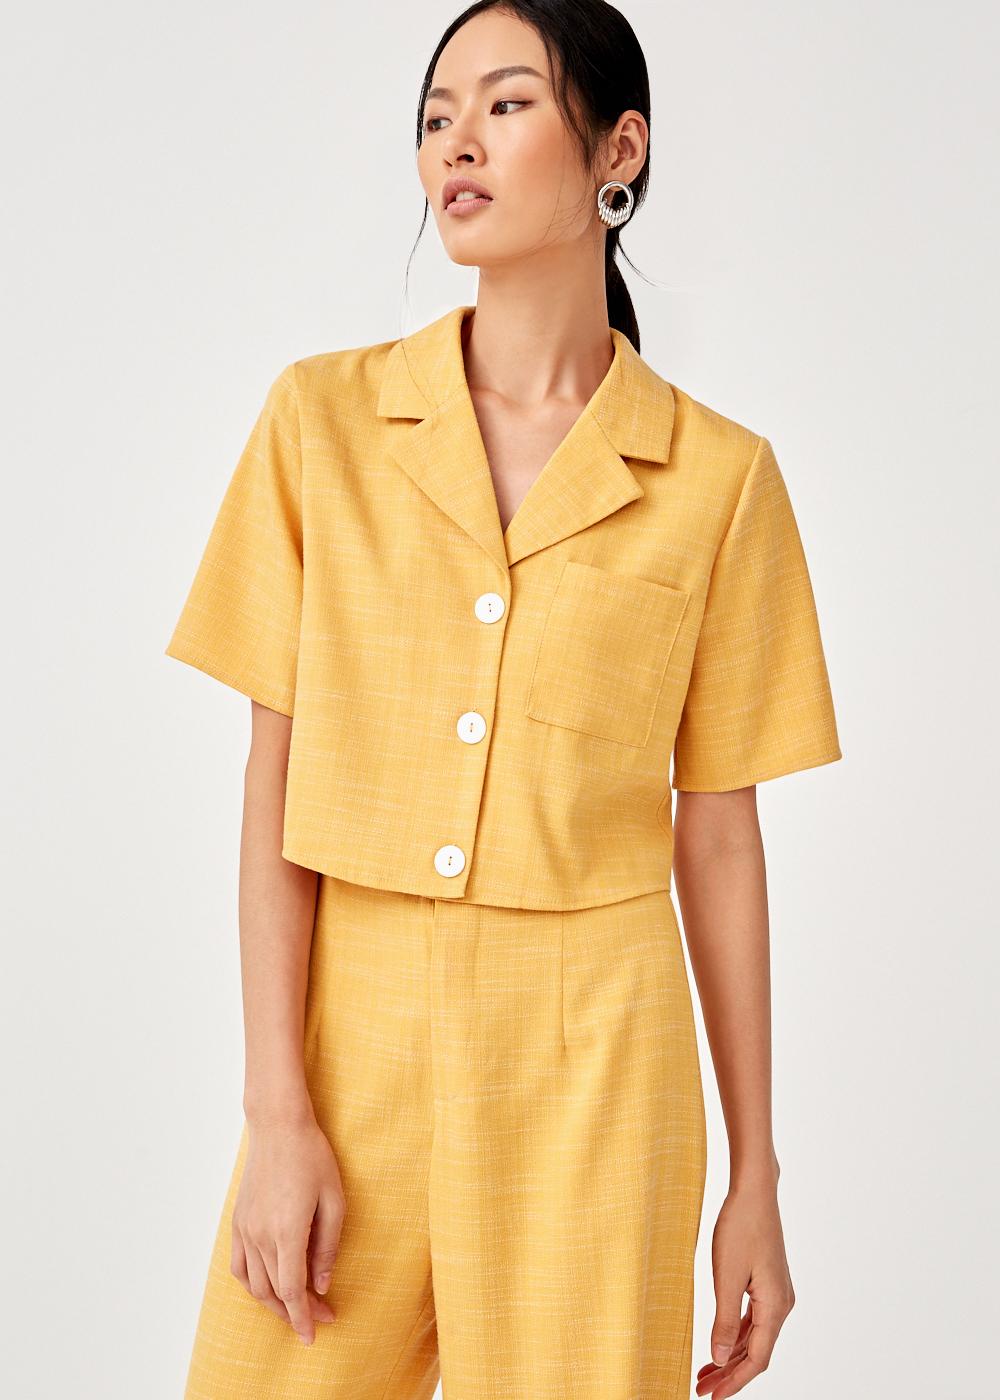 Caressa Revere Collar Shirt